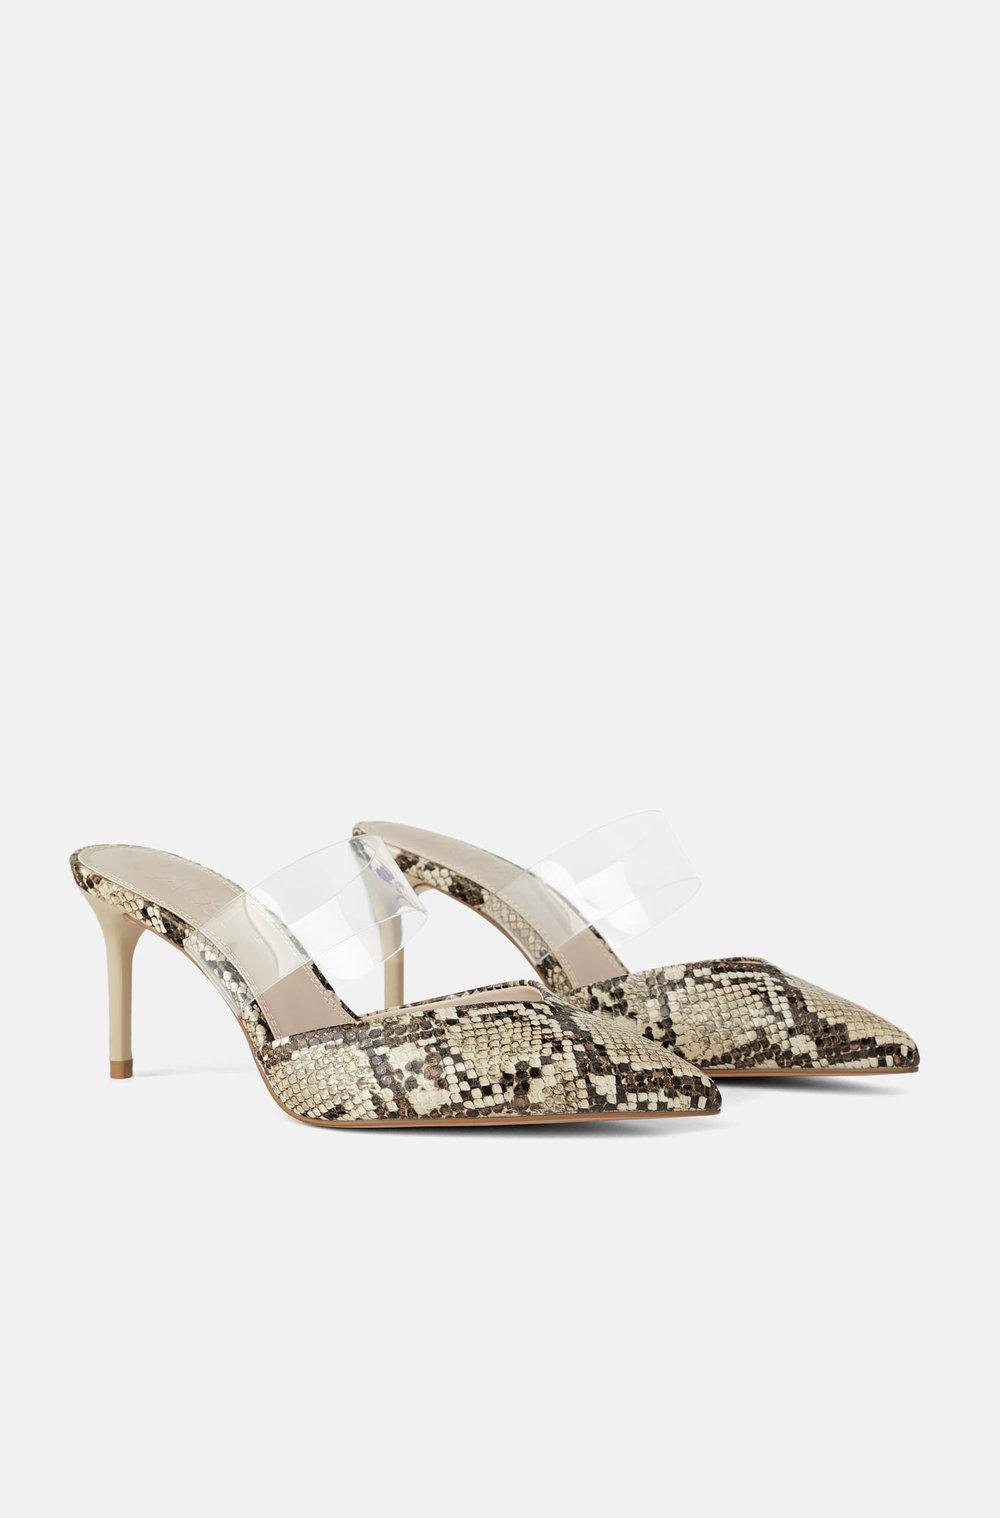 Zara Snakeskin Shoes       $39.90